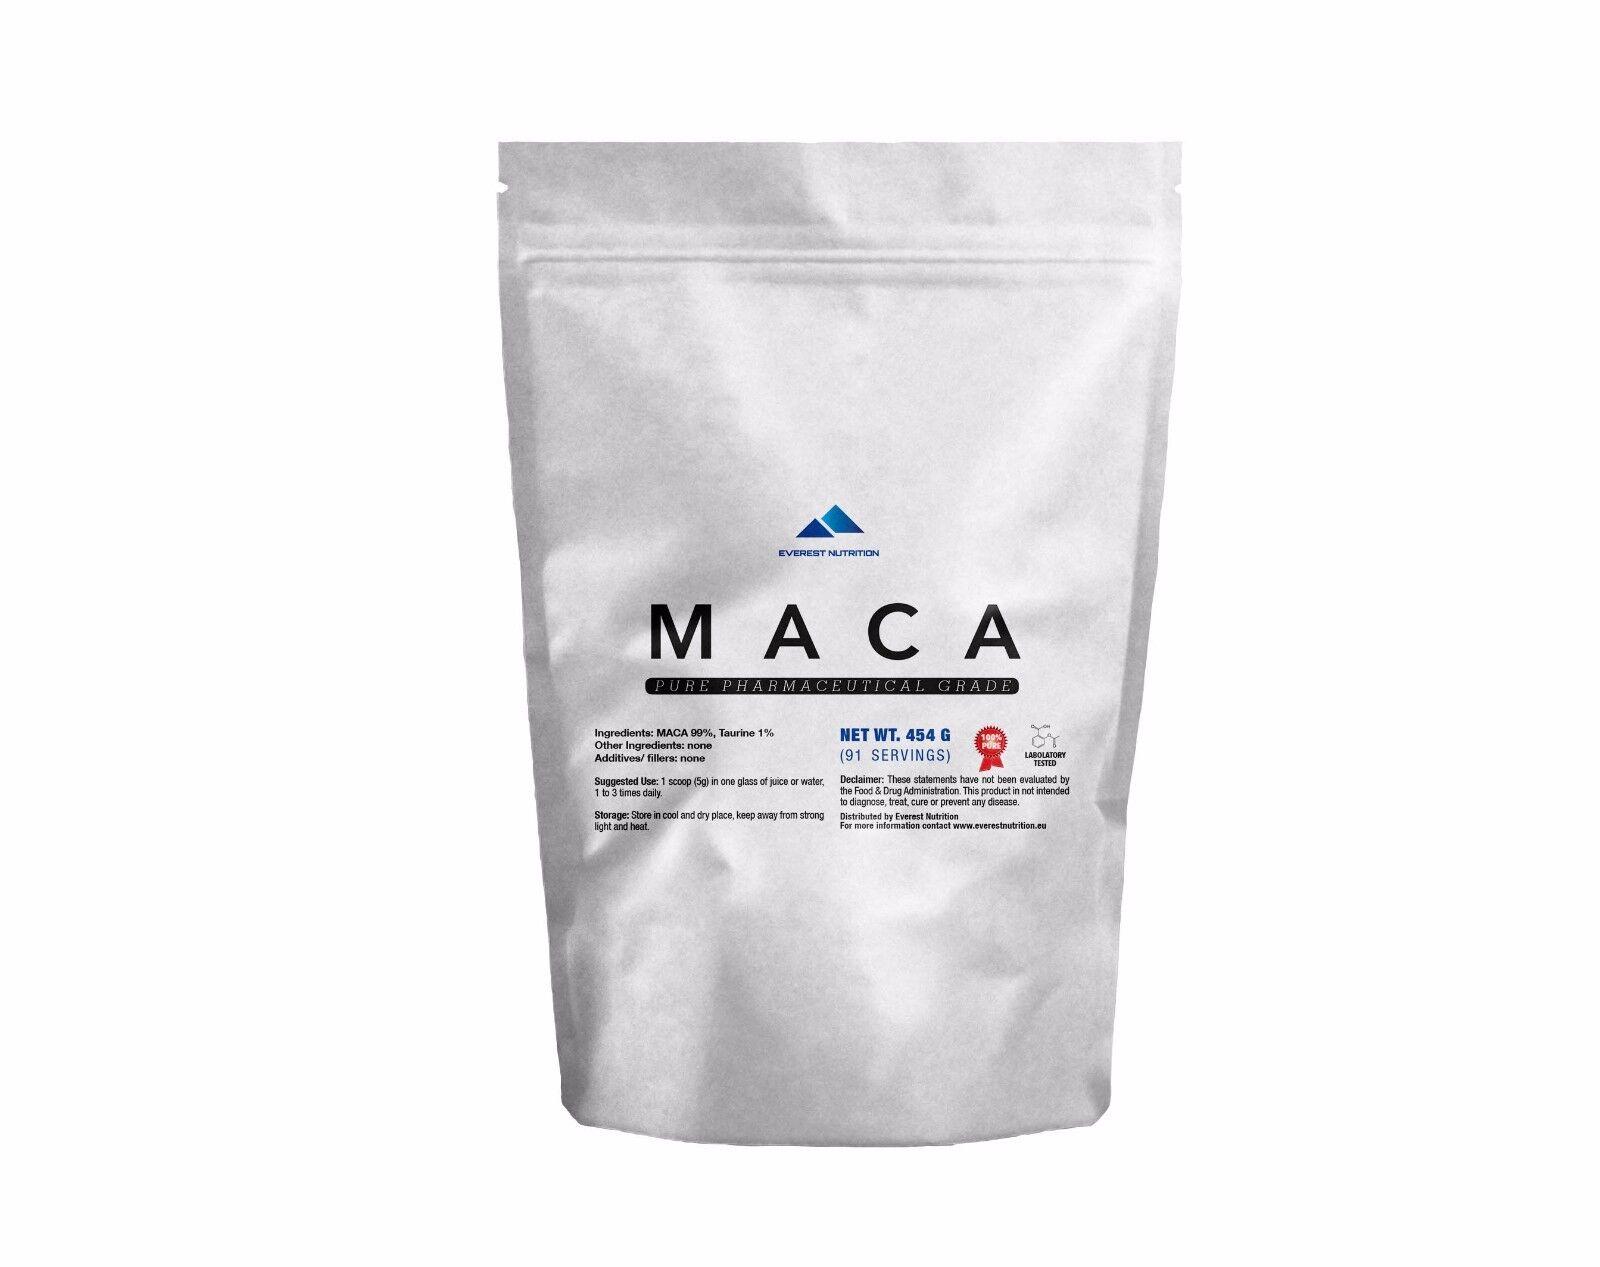 MACA Lepidium meyenii SUPERFOODS 100% PURE ORGANIC POWDER SUPERFOODS meyenii 8c2d7f